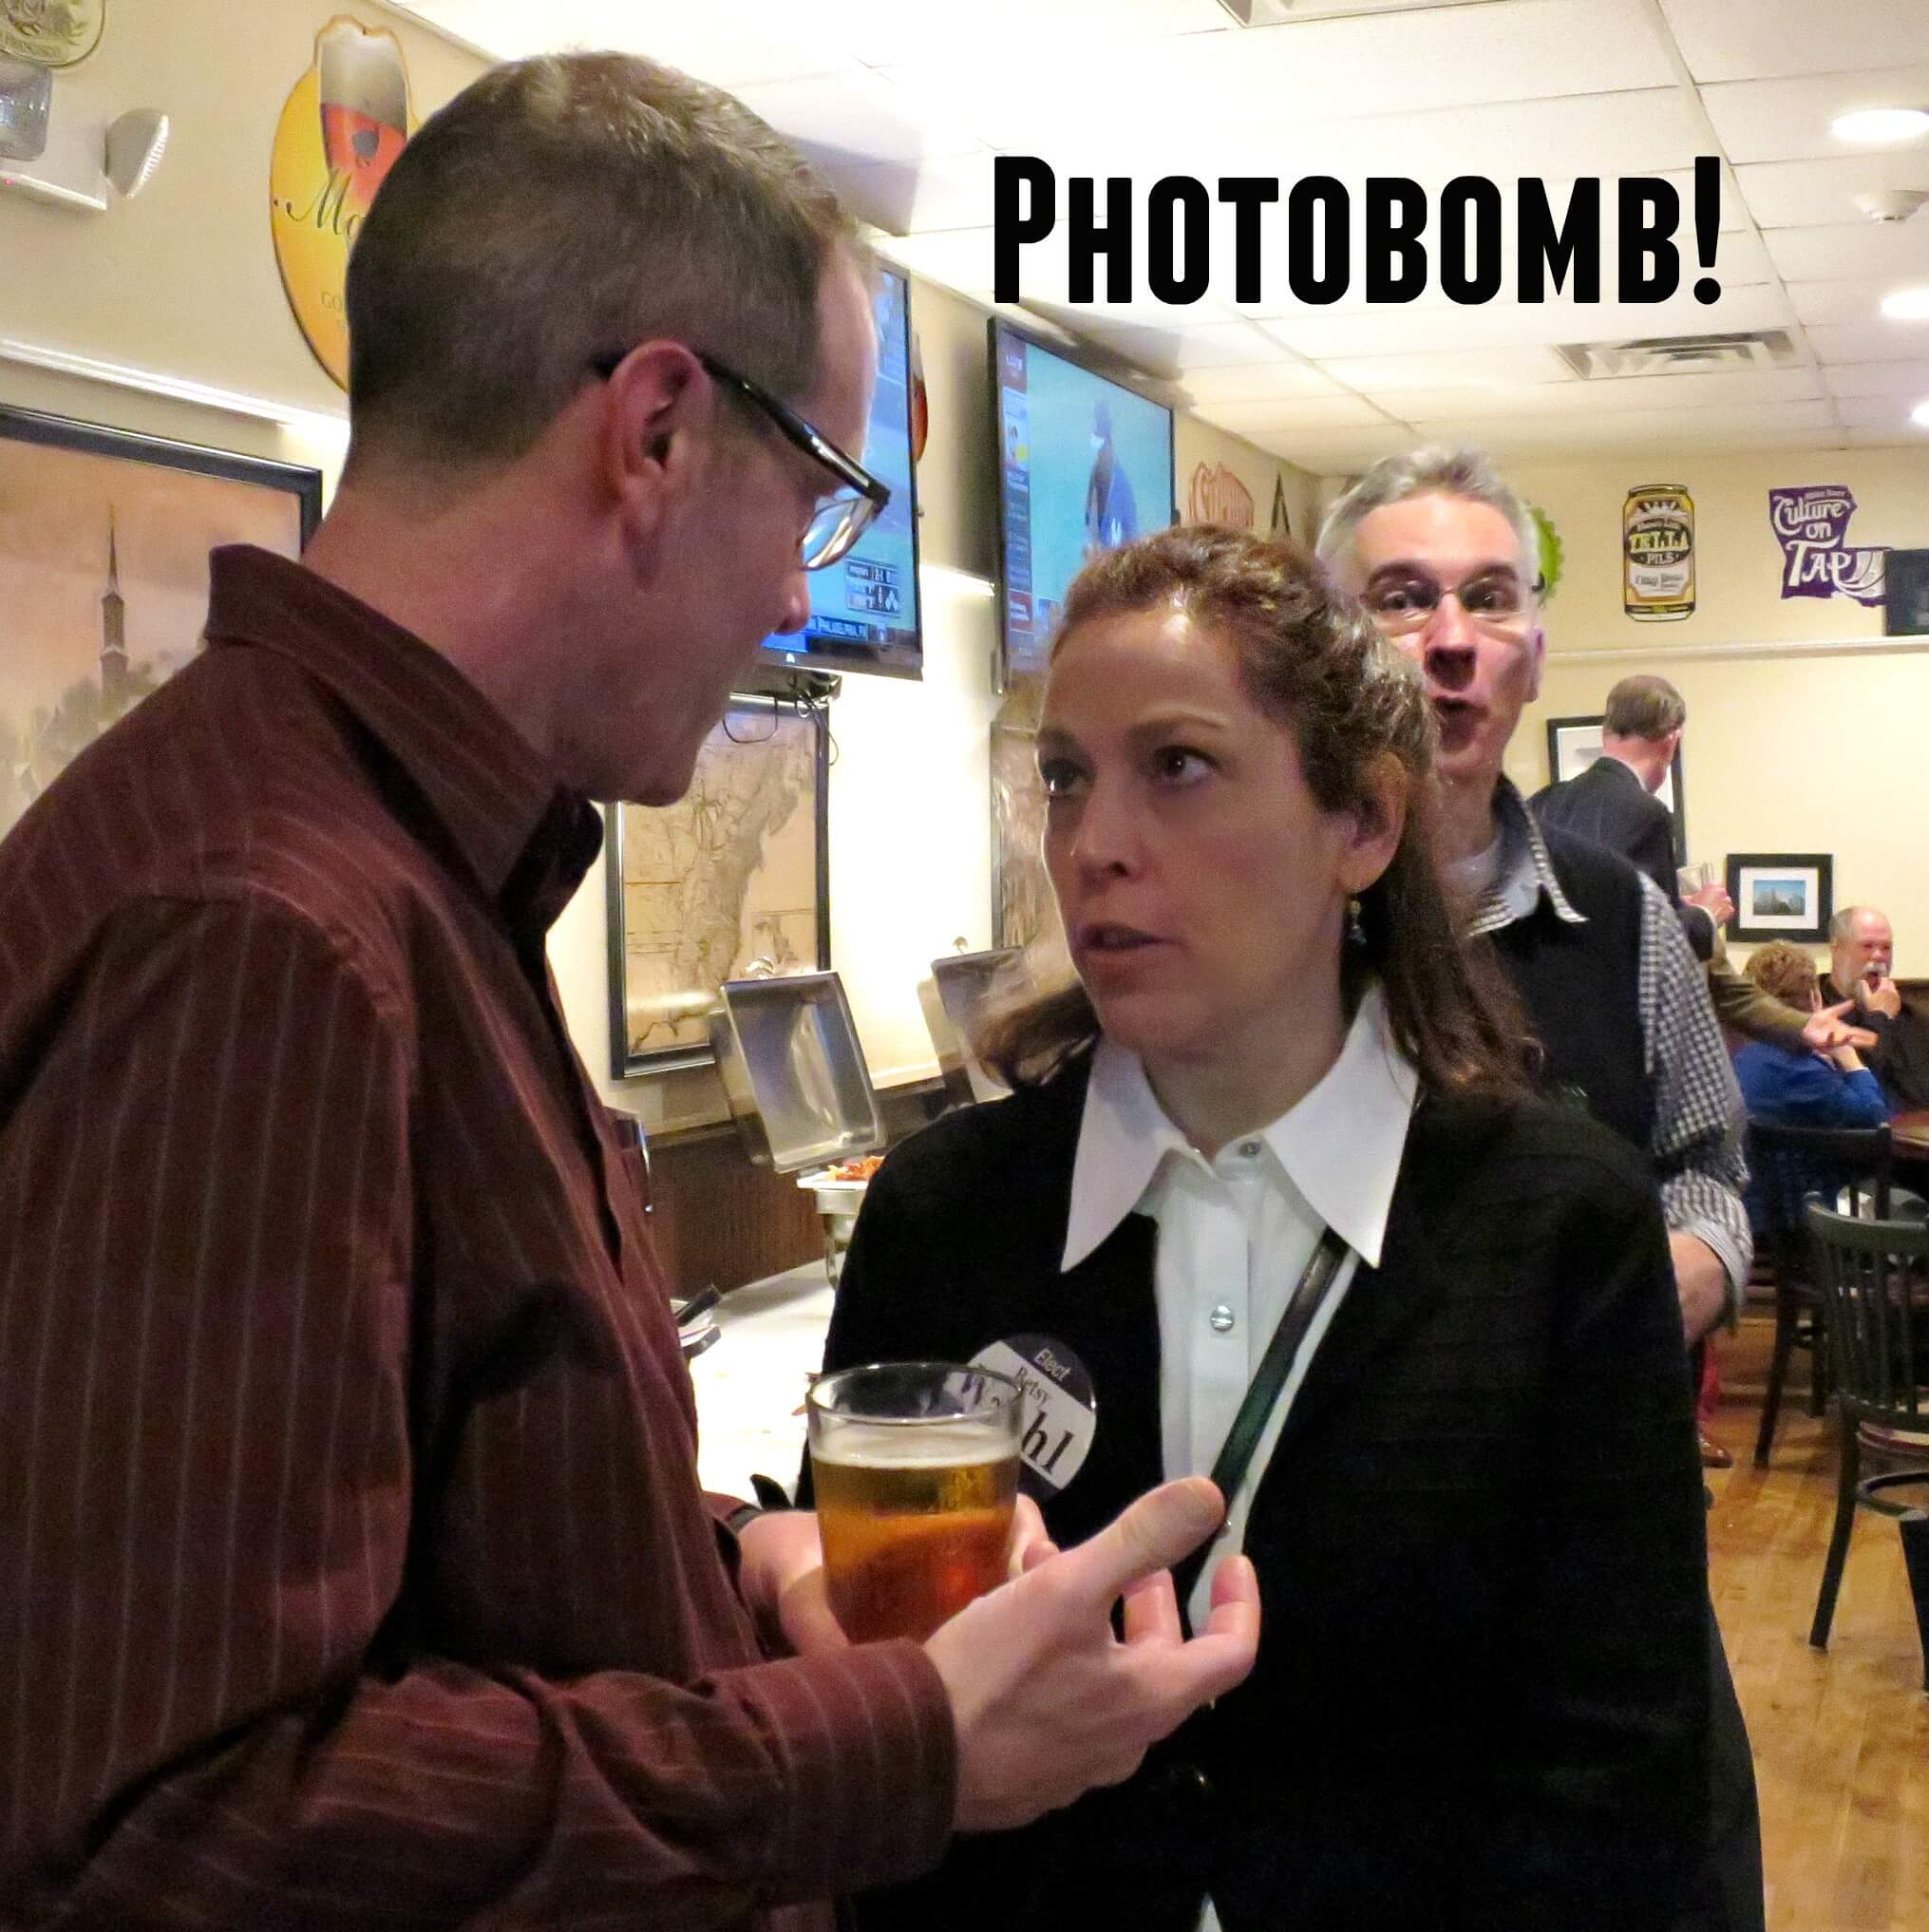 EastFallsLocal crop Steve and betsy chris photobomb